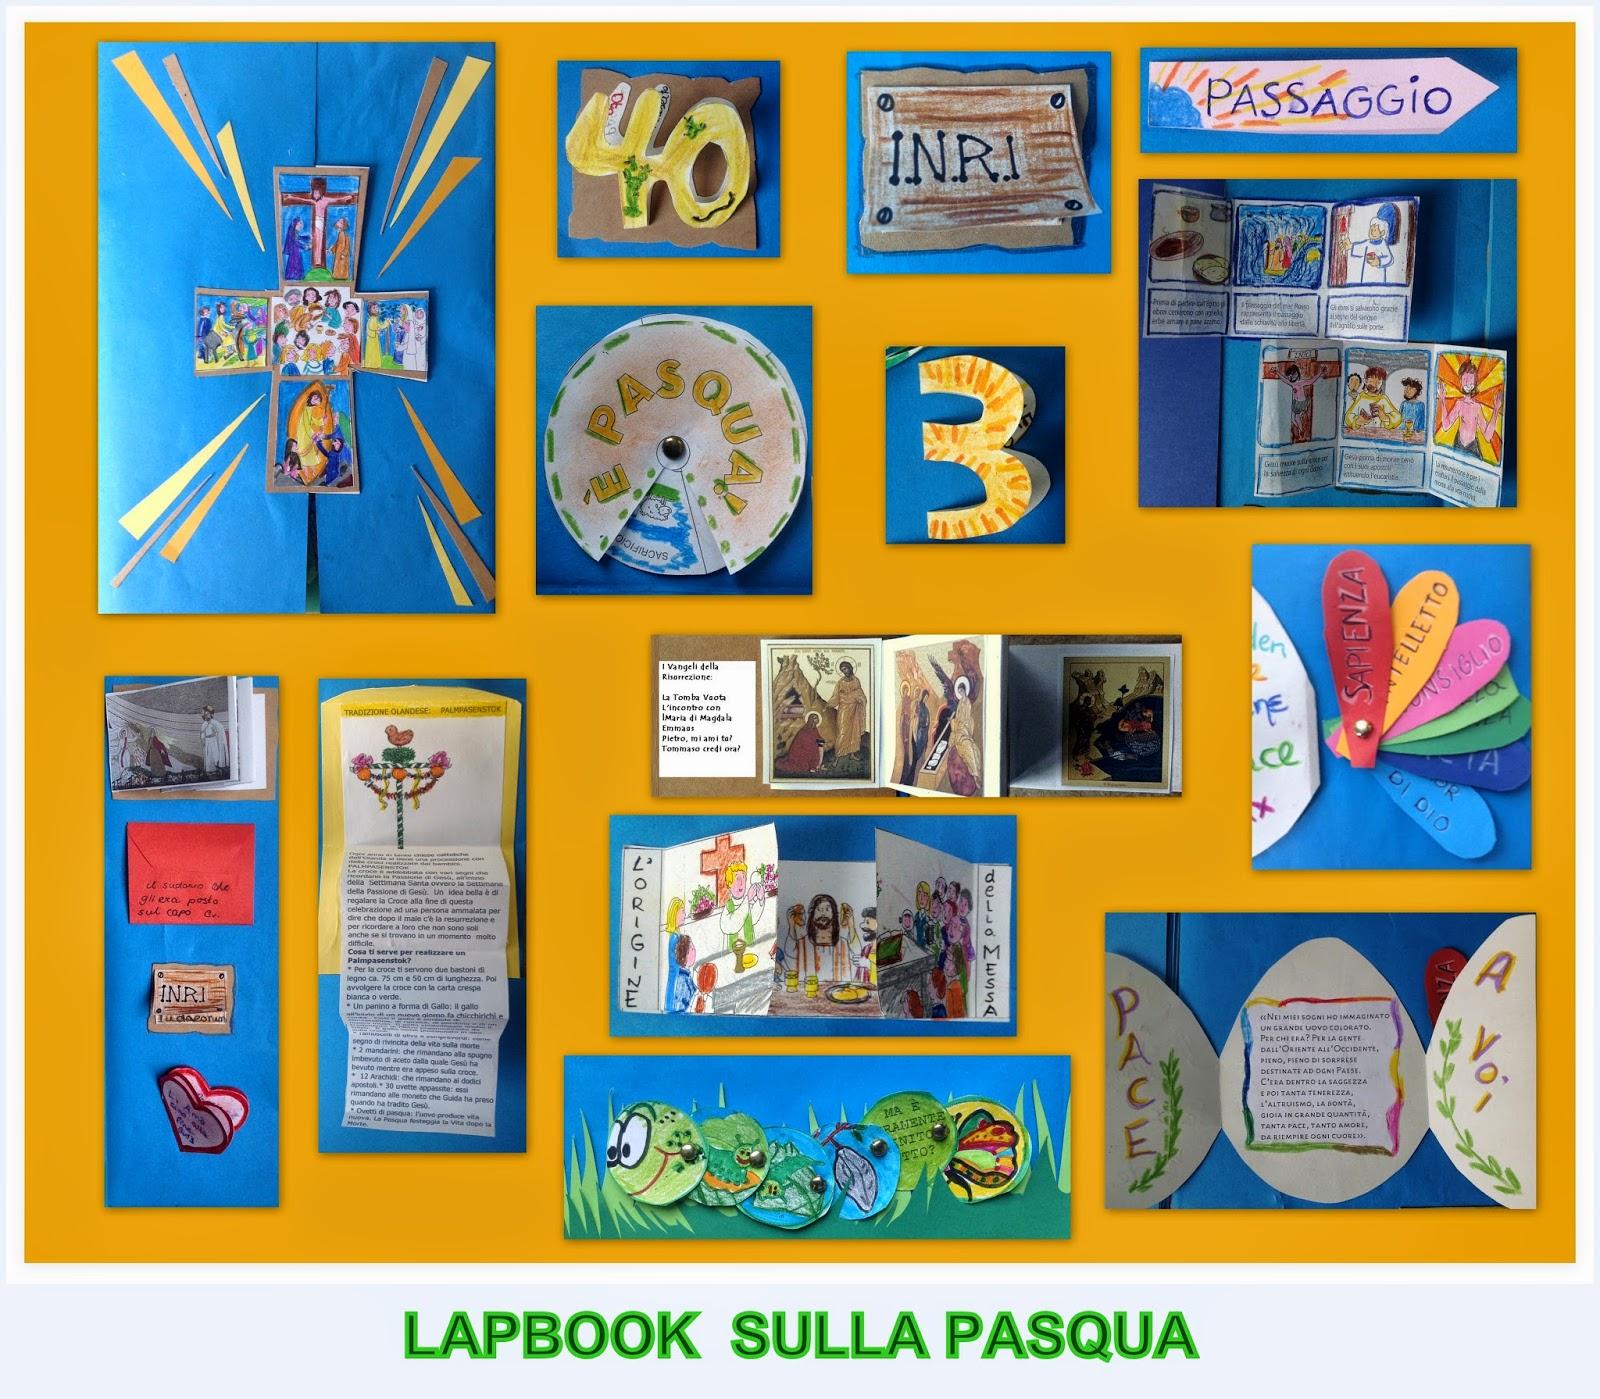 Finestrelle: Re- Play Lapbook Pasqua